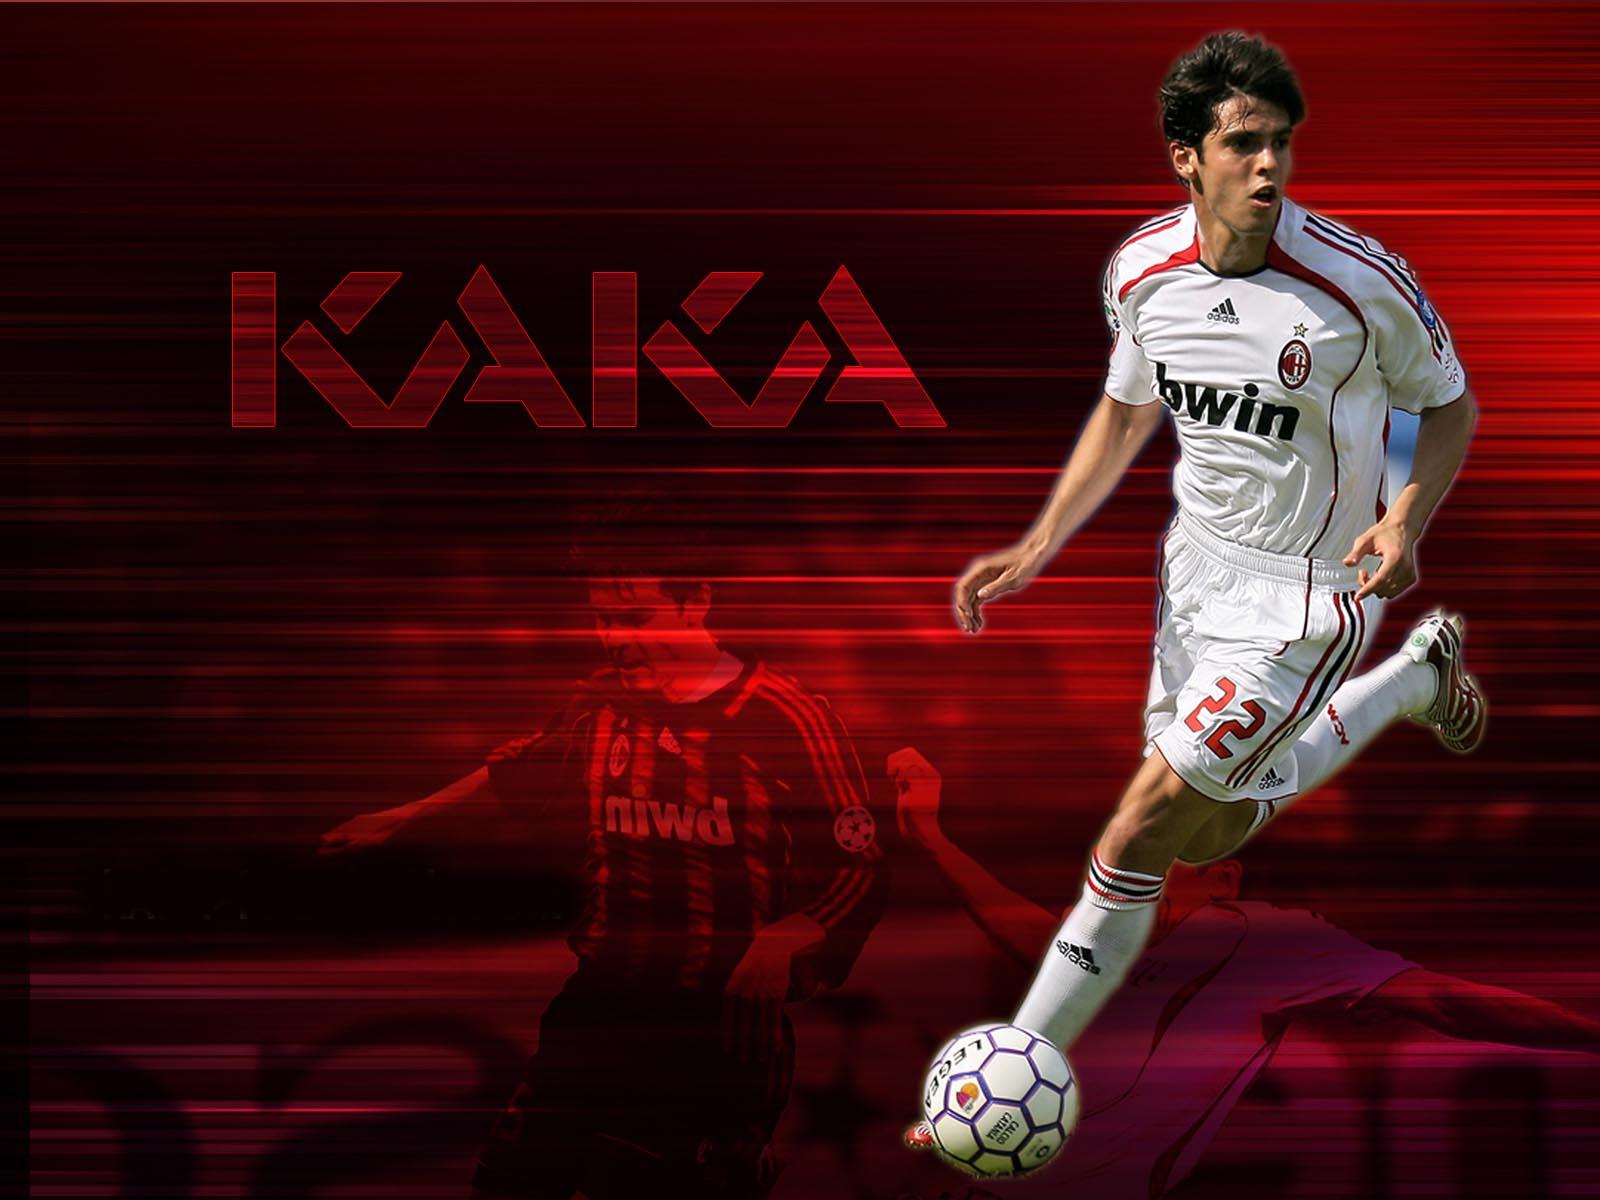 download Kaka Real Madrid CF Mac HD Wallpaper Wallpaper 1600x1200